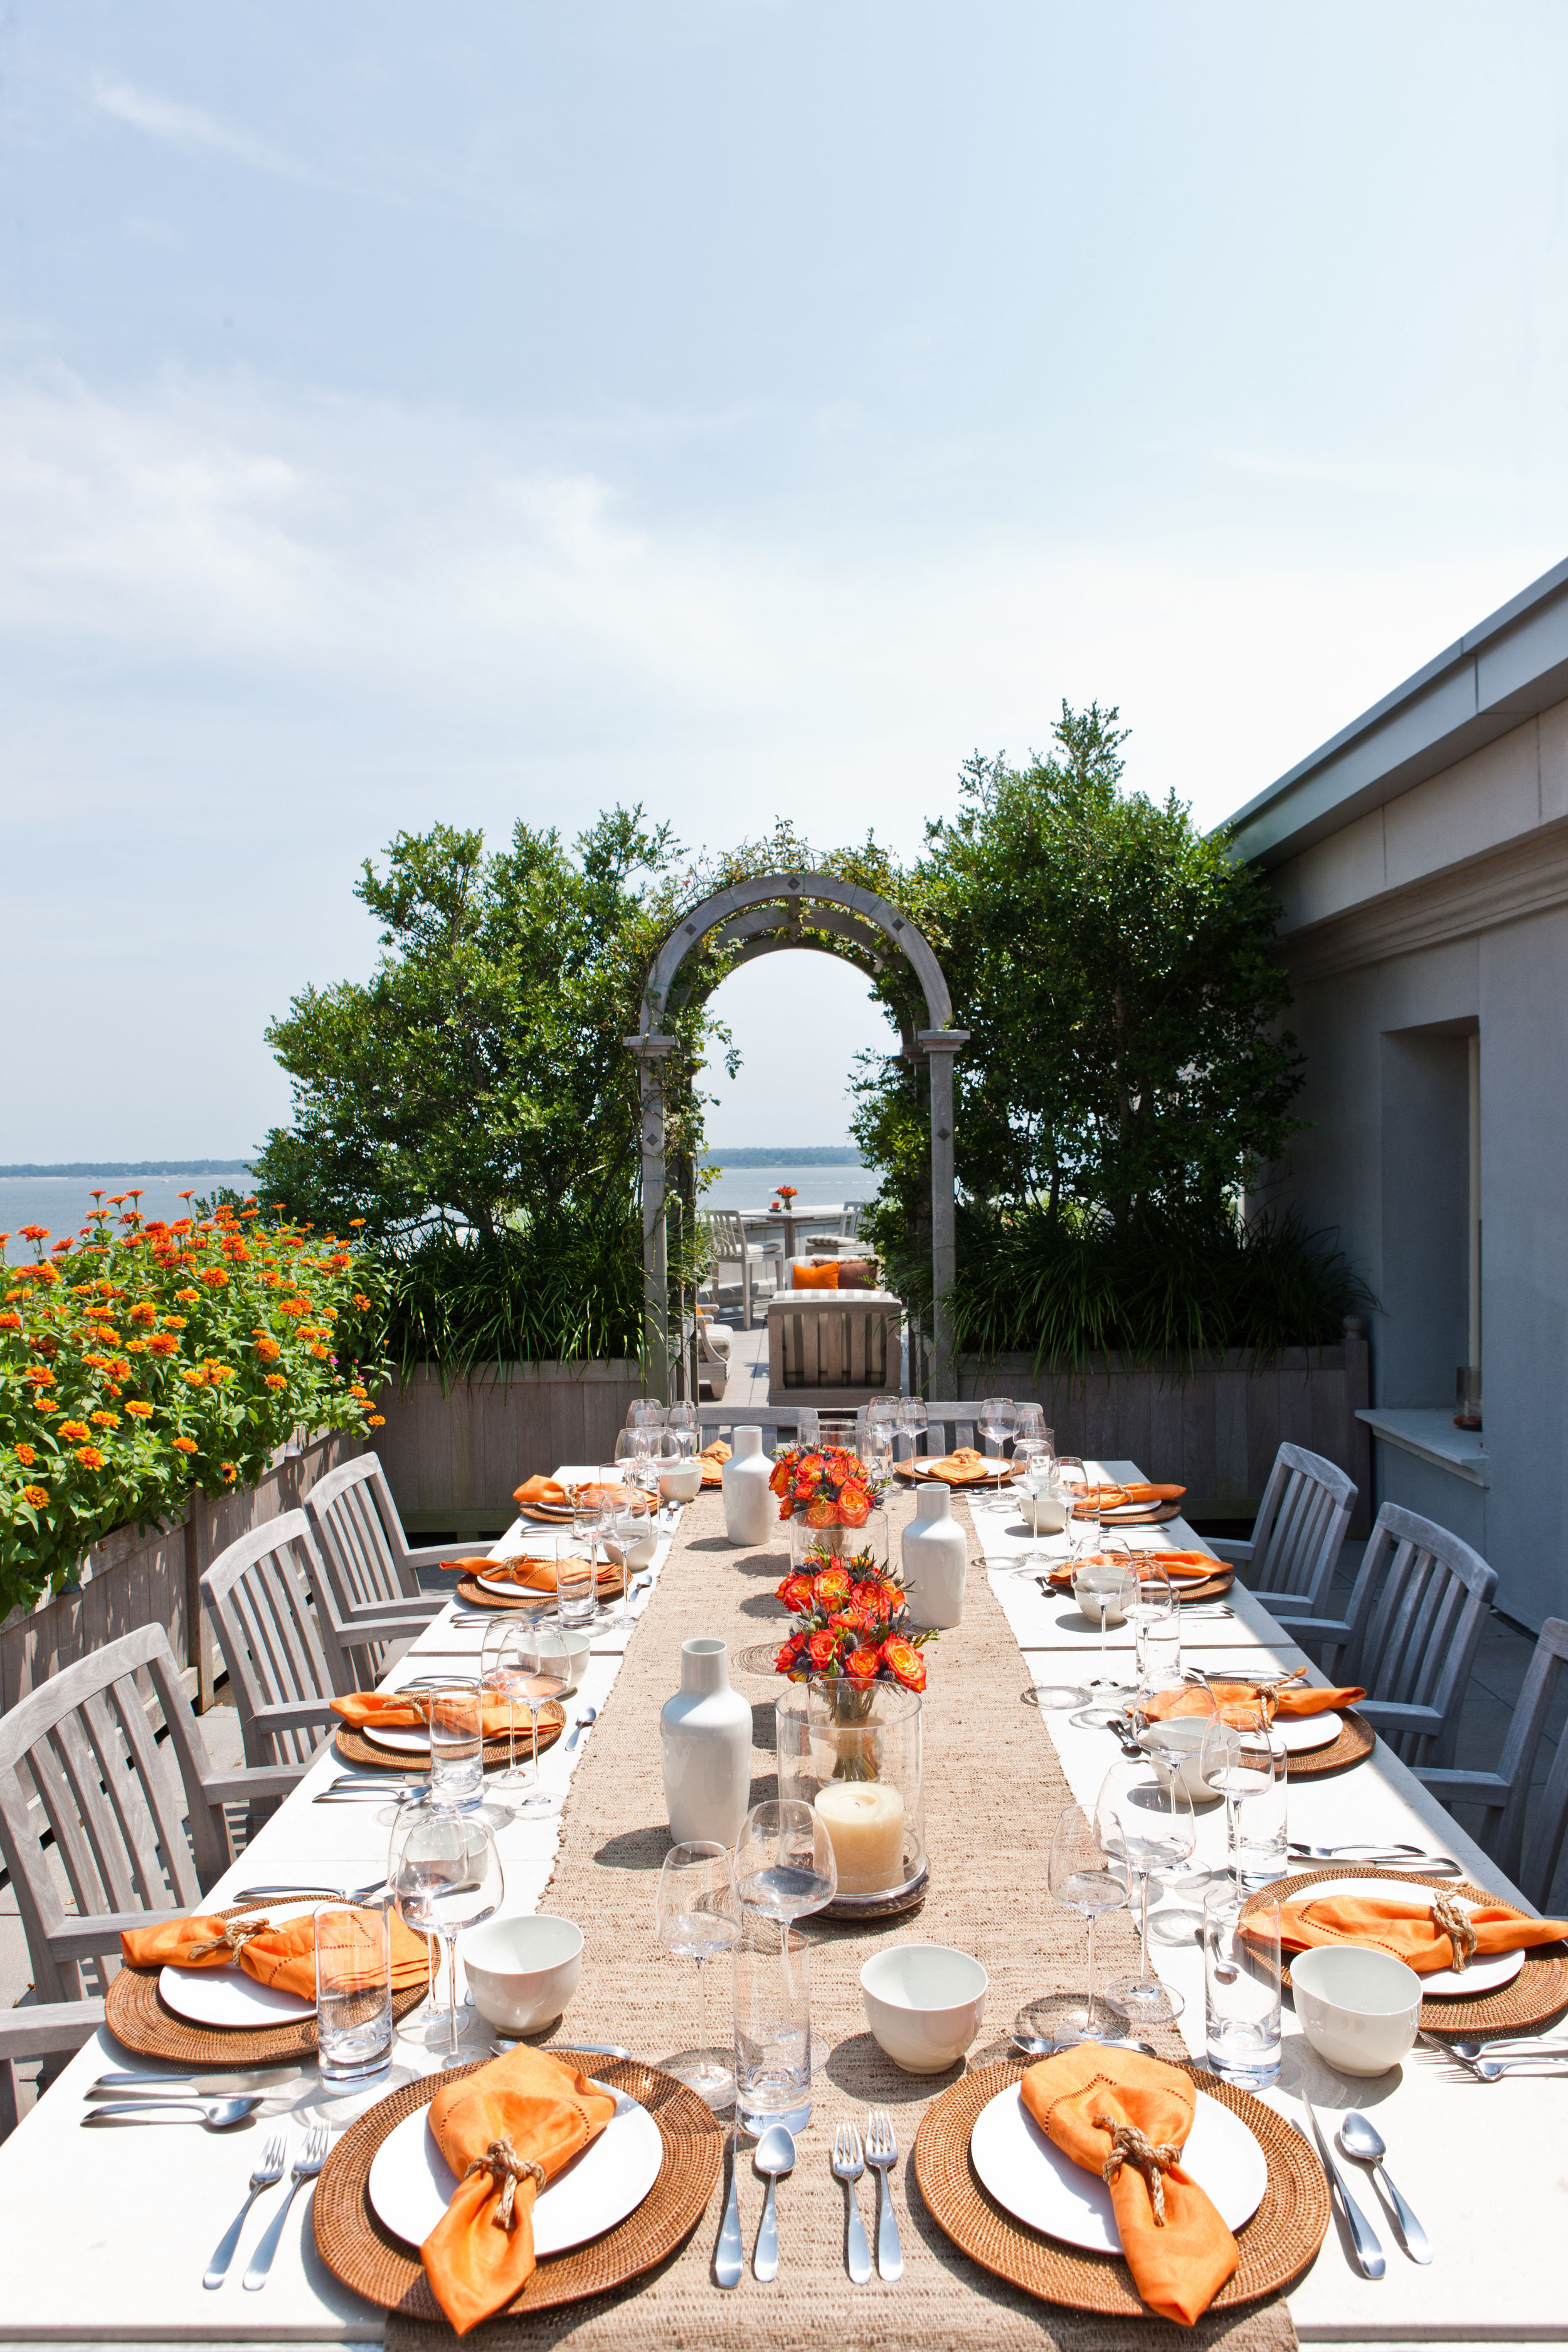 #24 rooftop dining.jpg